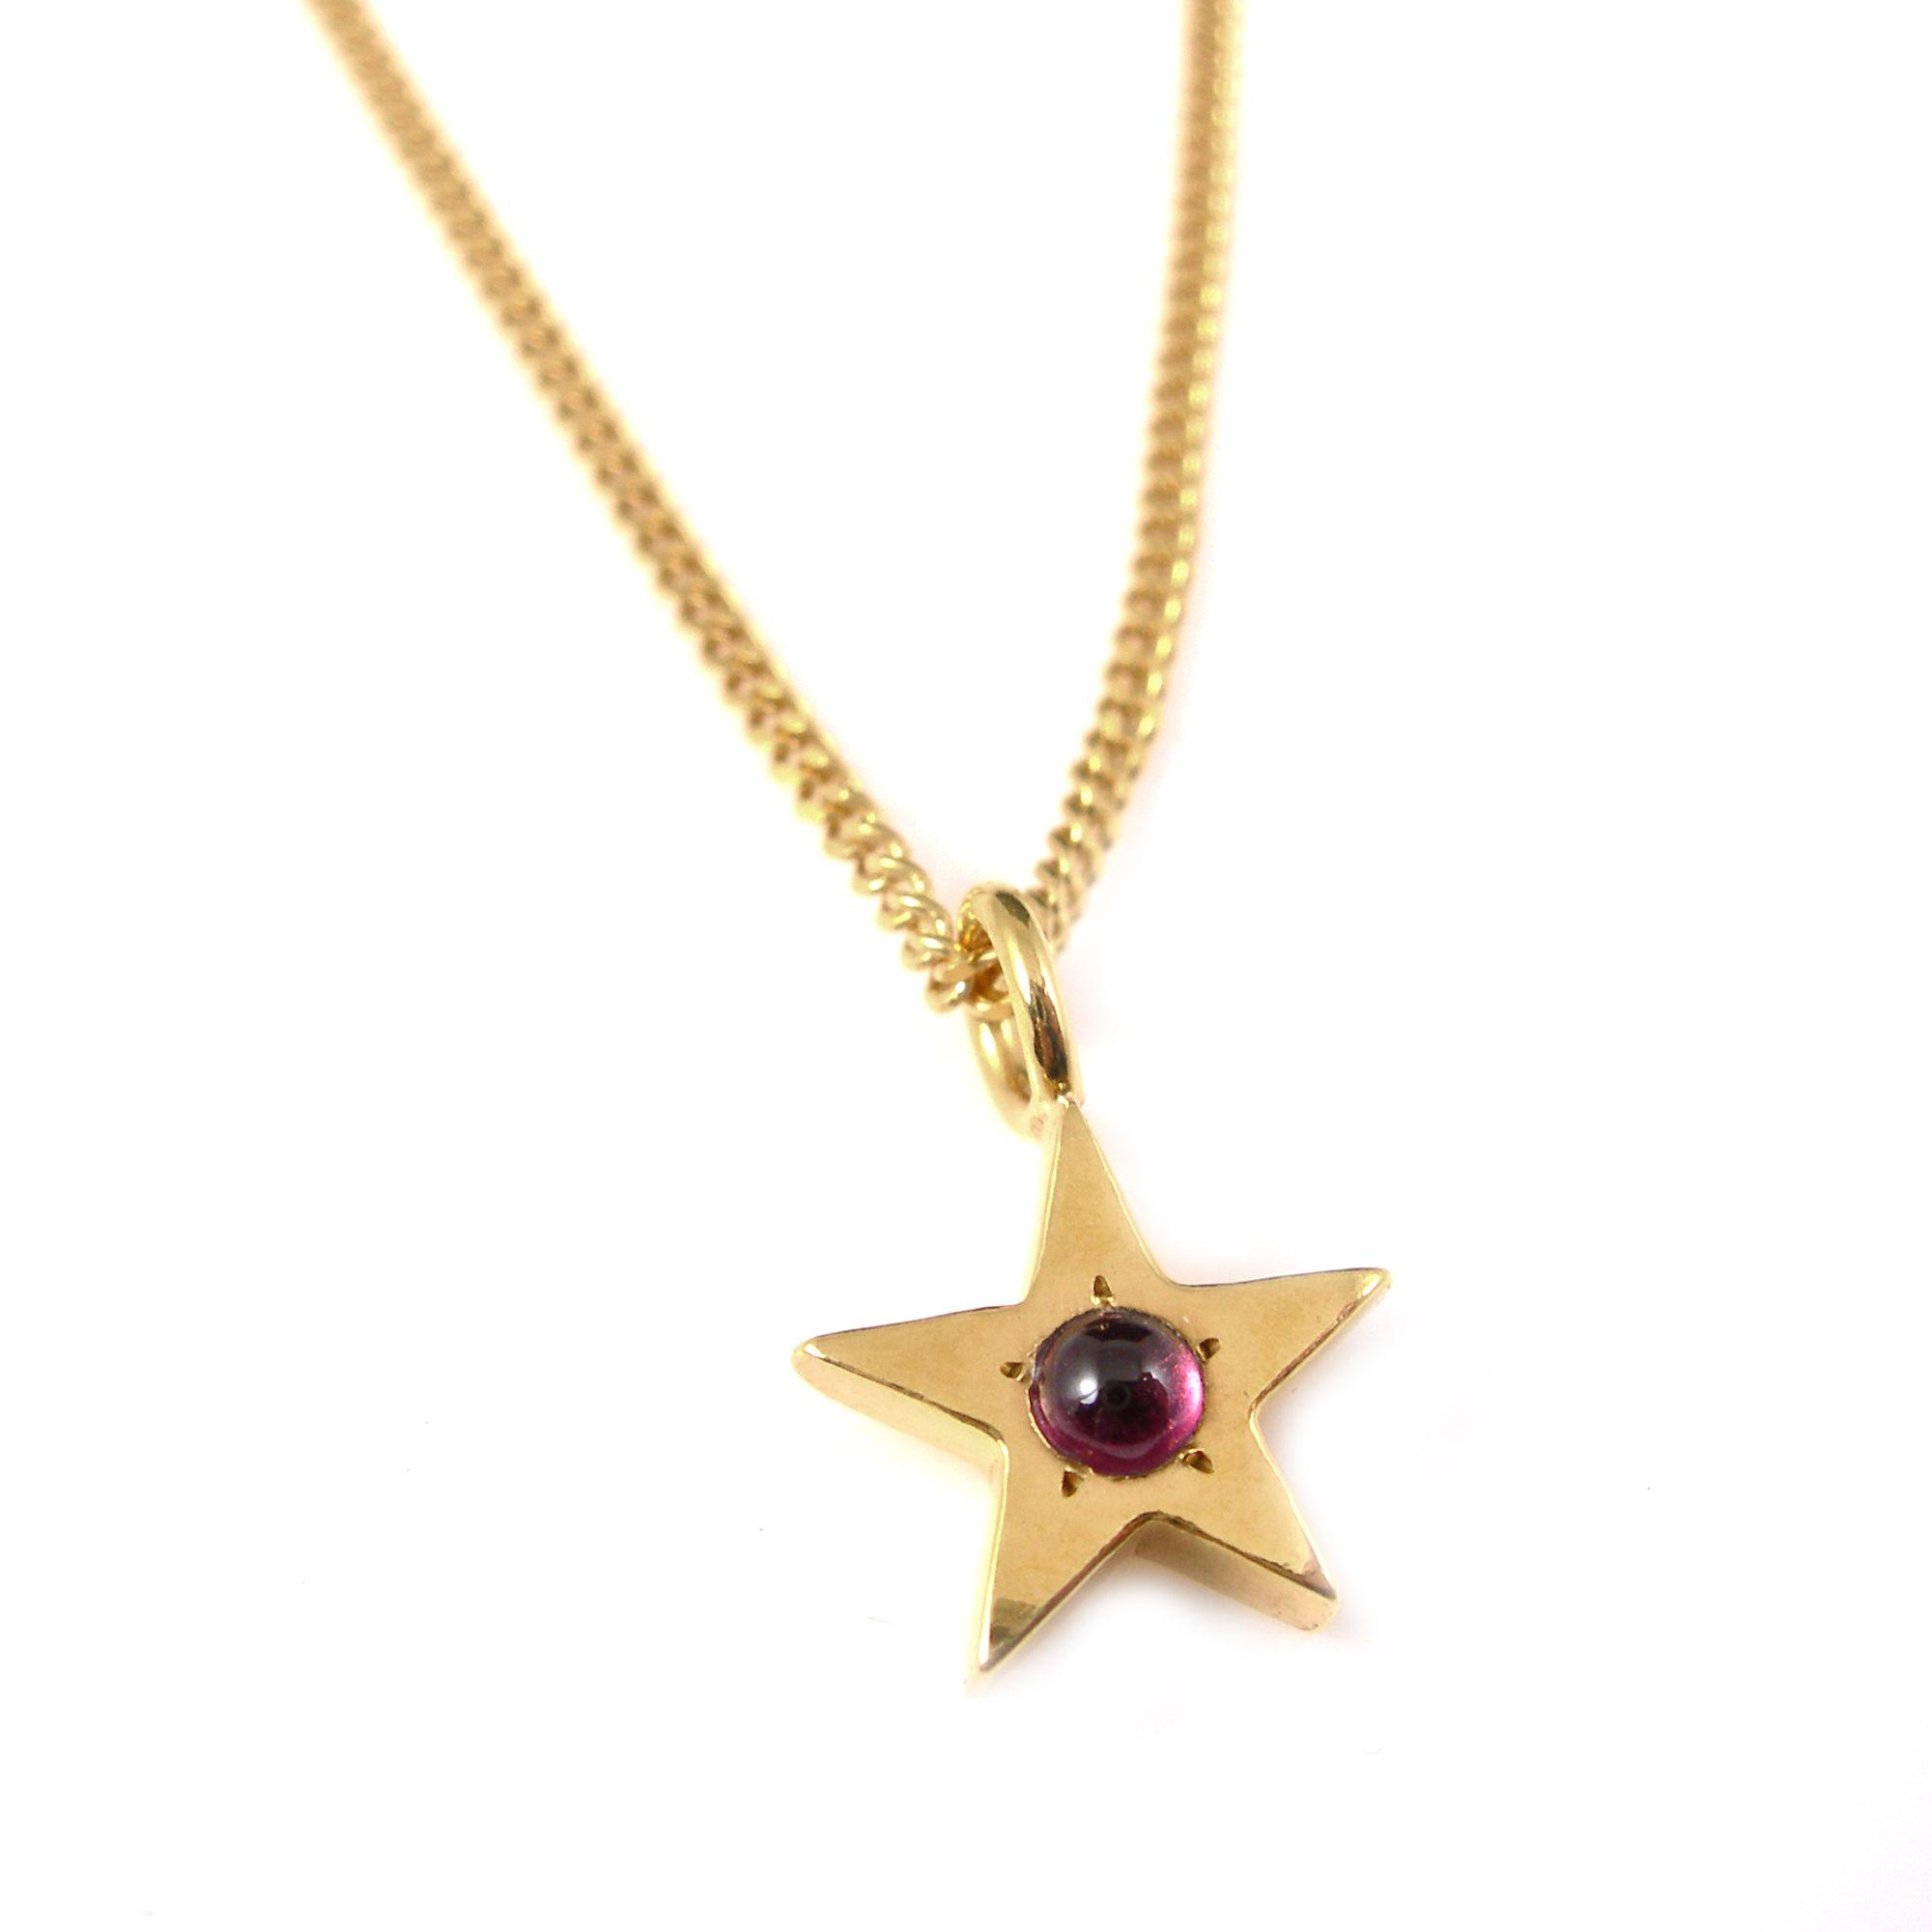 Garnet, gold star necklace